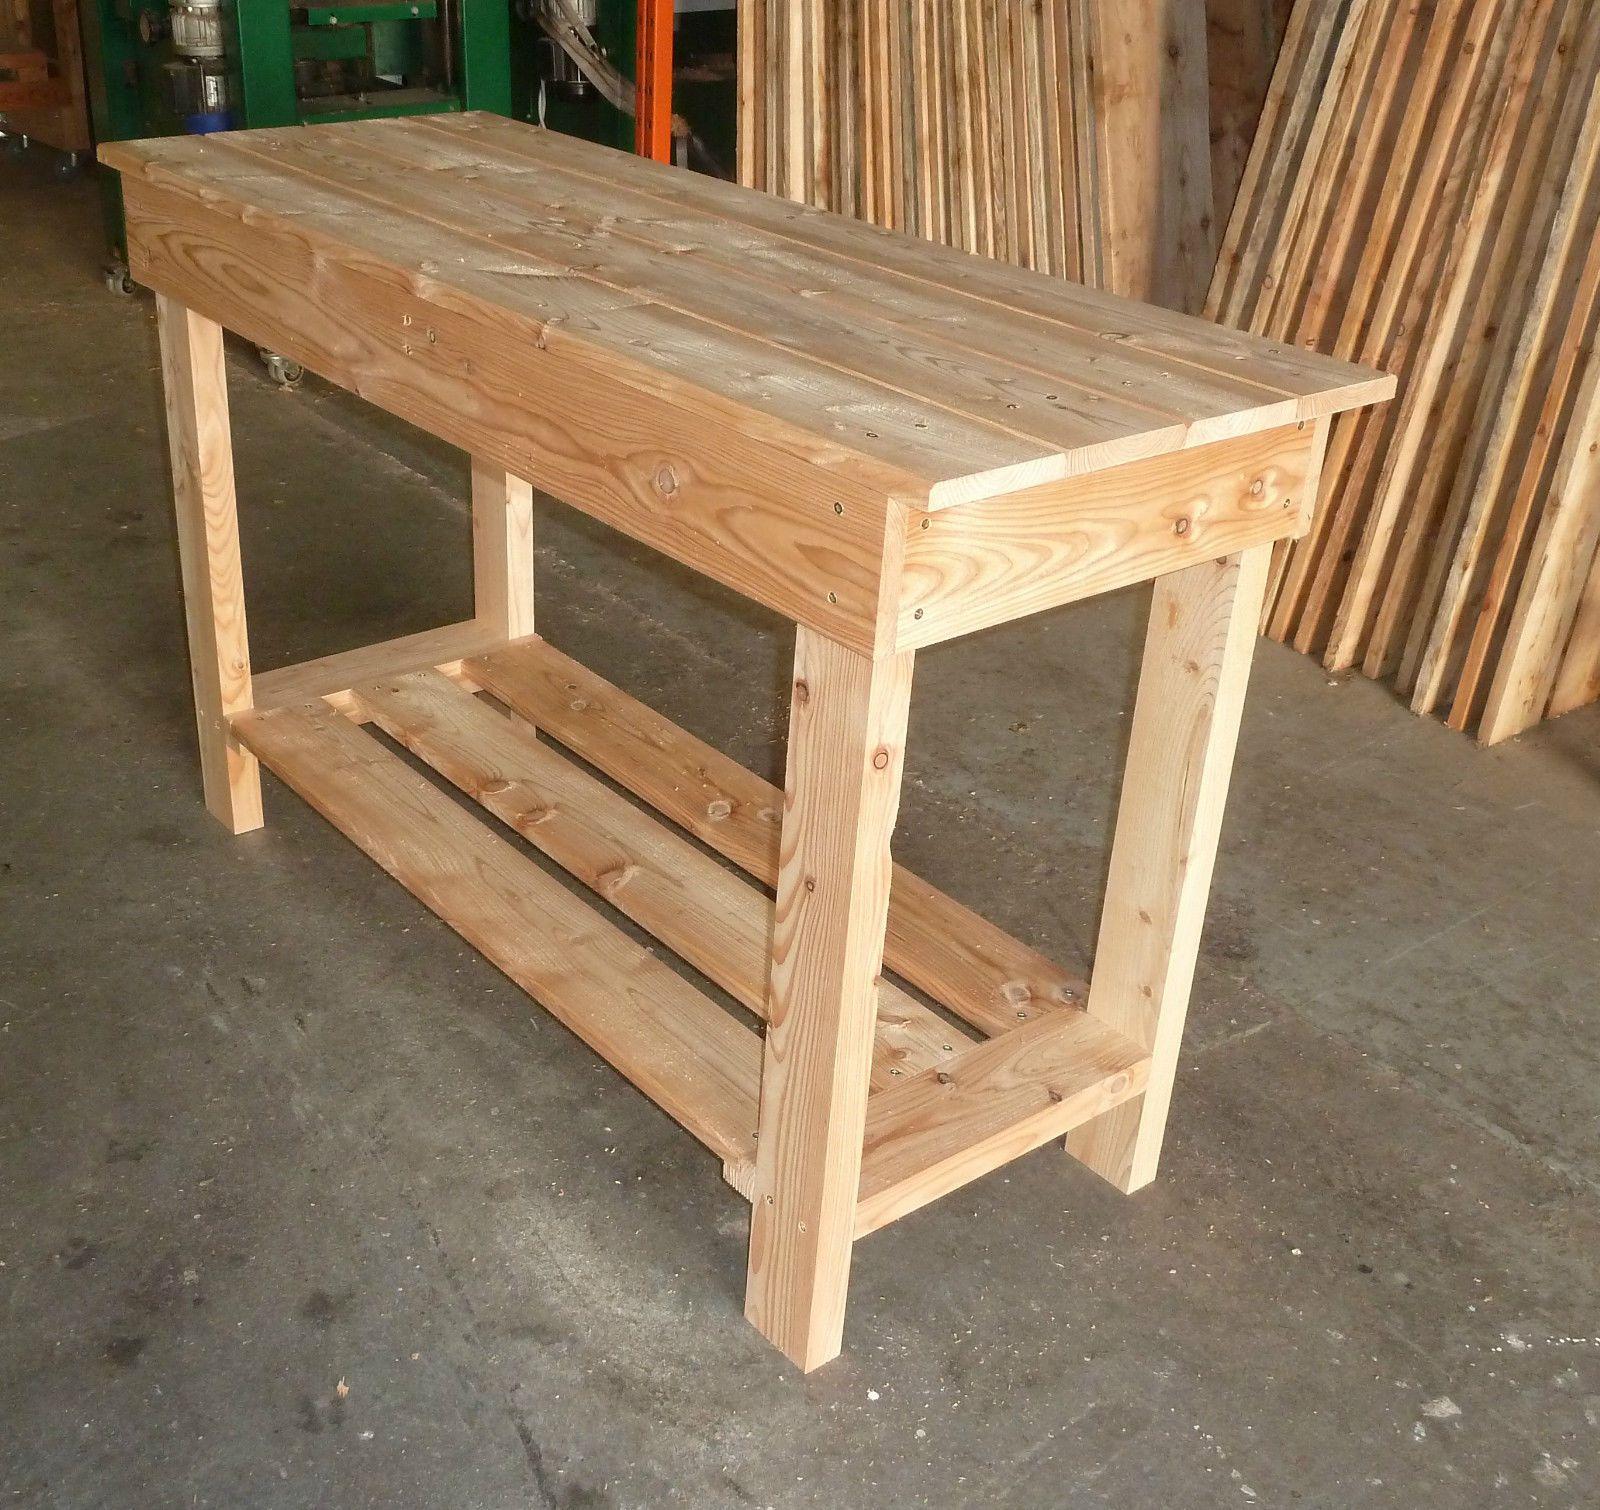 Wooden Work Bench 1.45m long great for garage v sturdy! | eBay